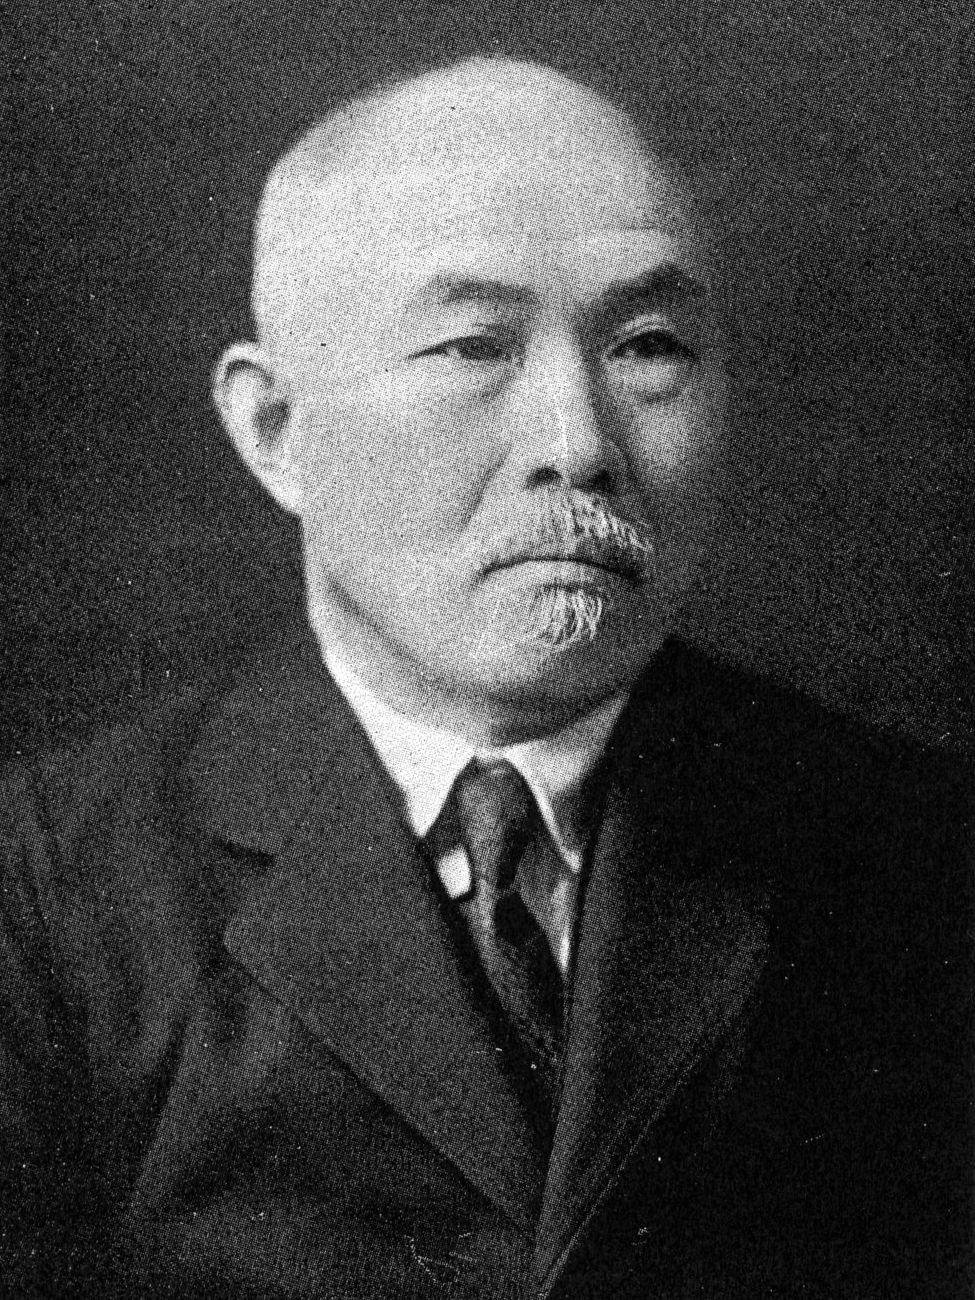 島田俊雄 - Wikiwand